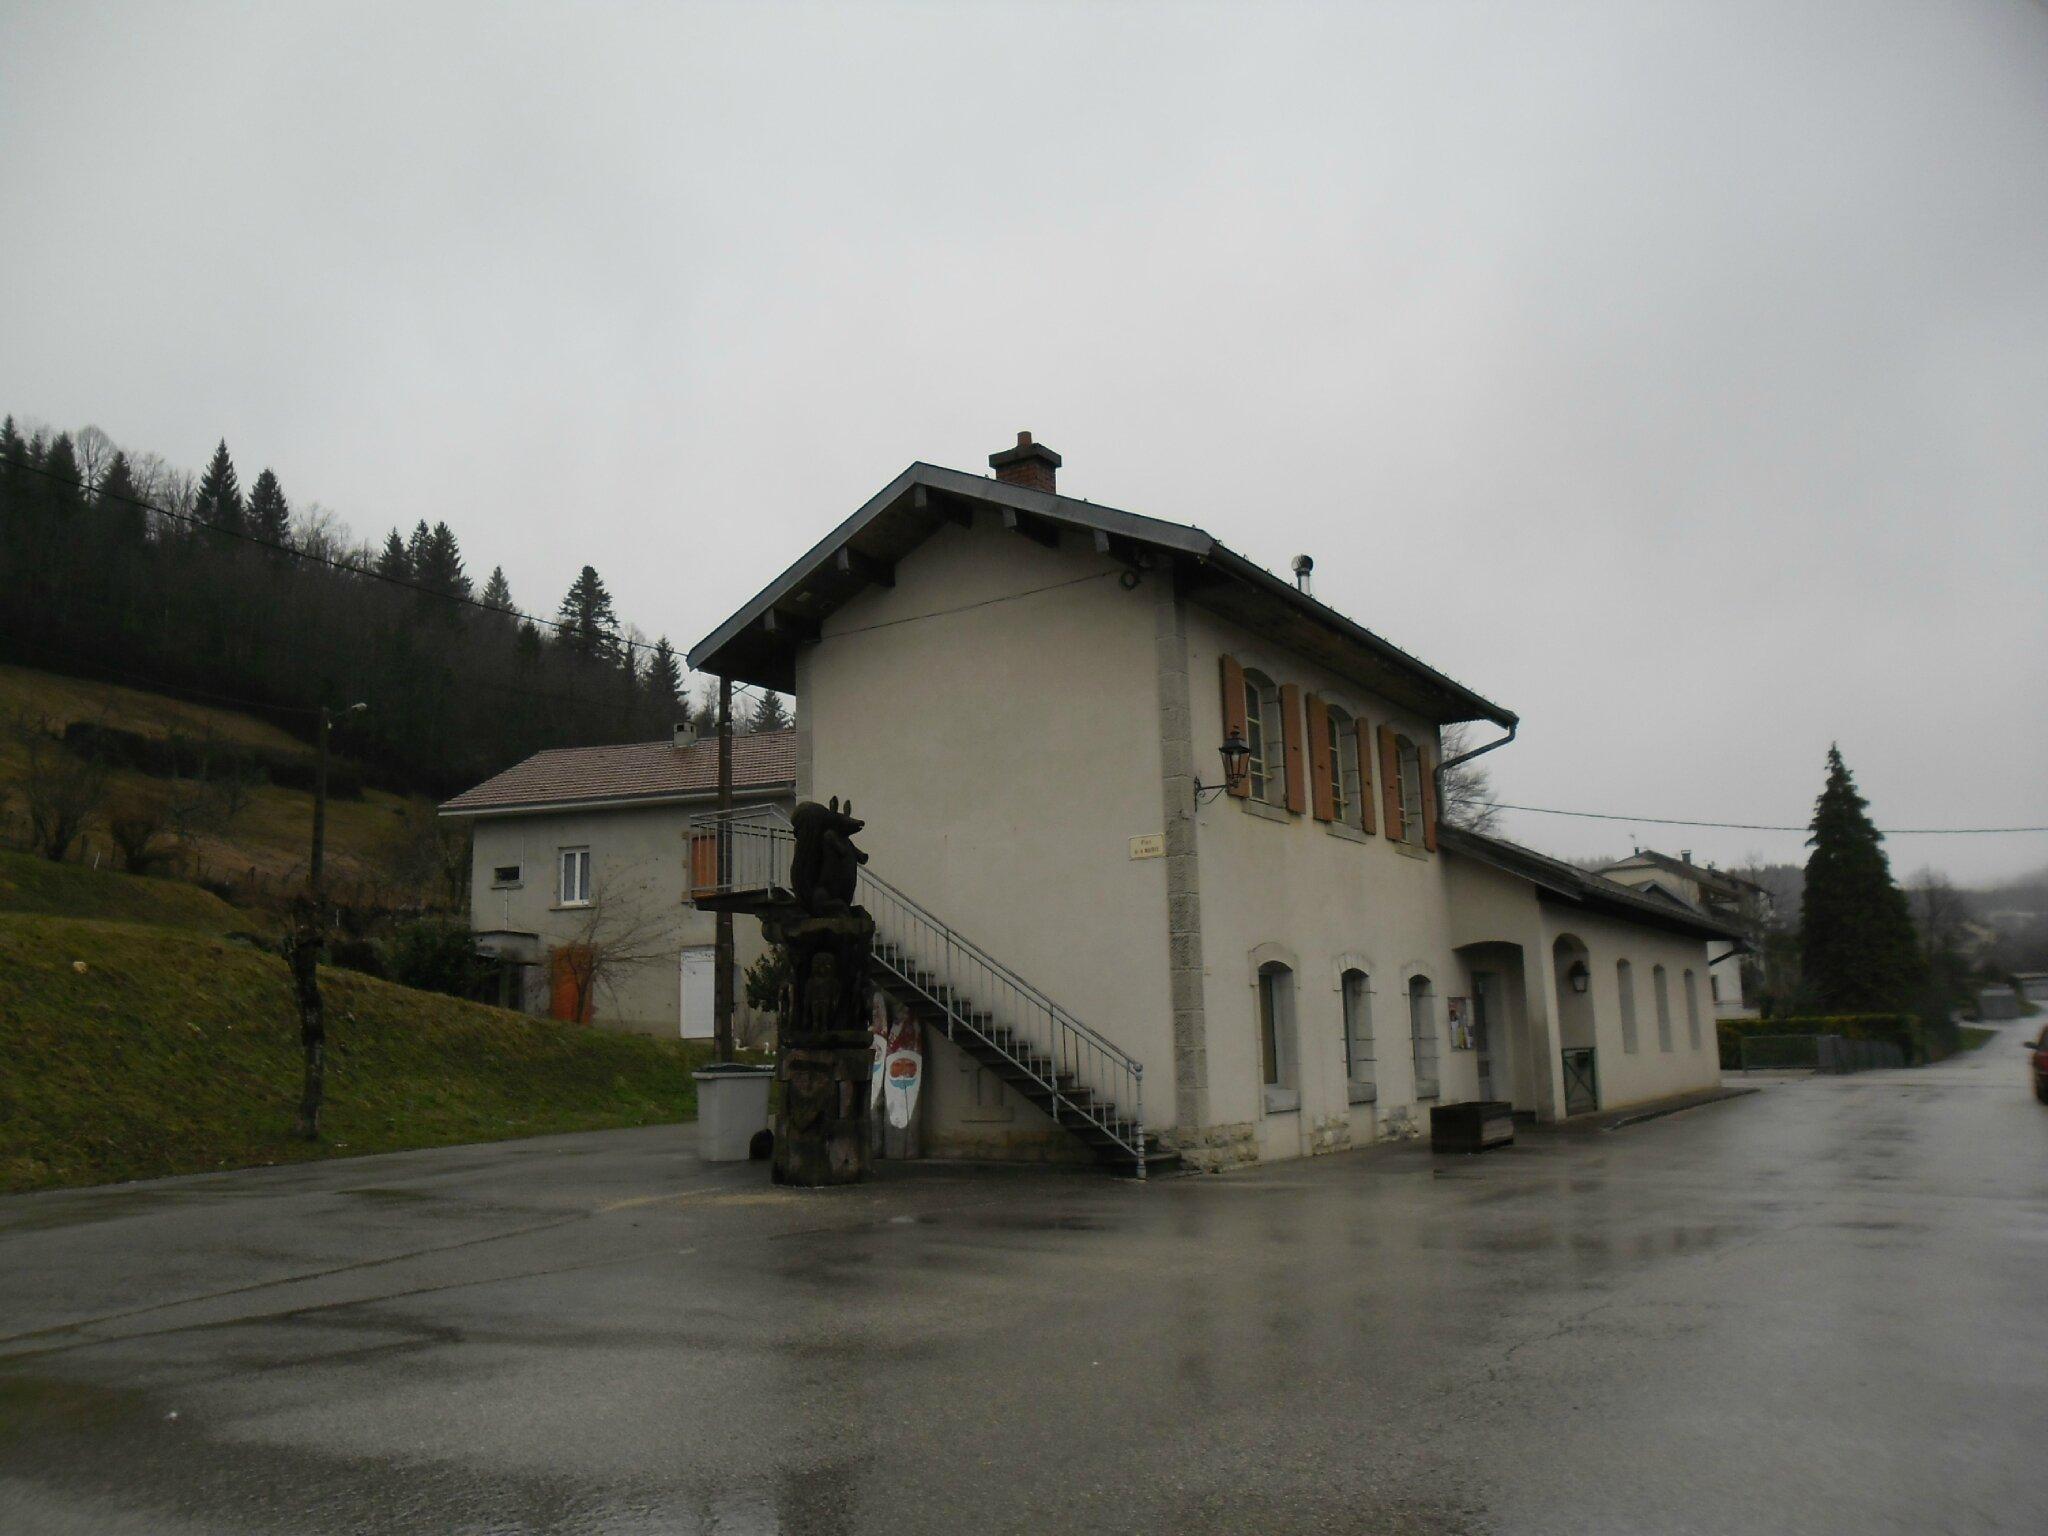 Villards-d'Héria (Jura)